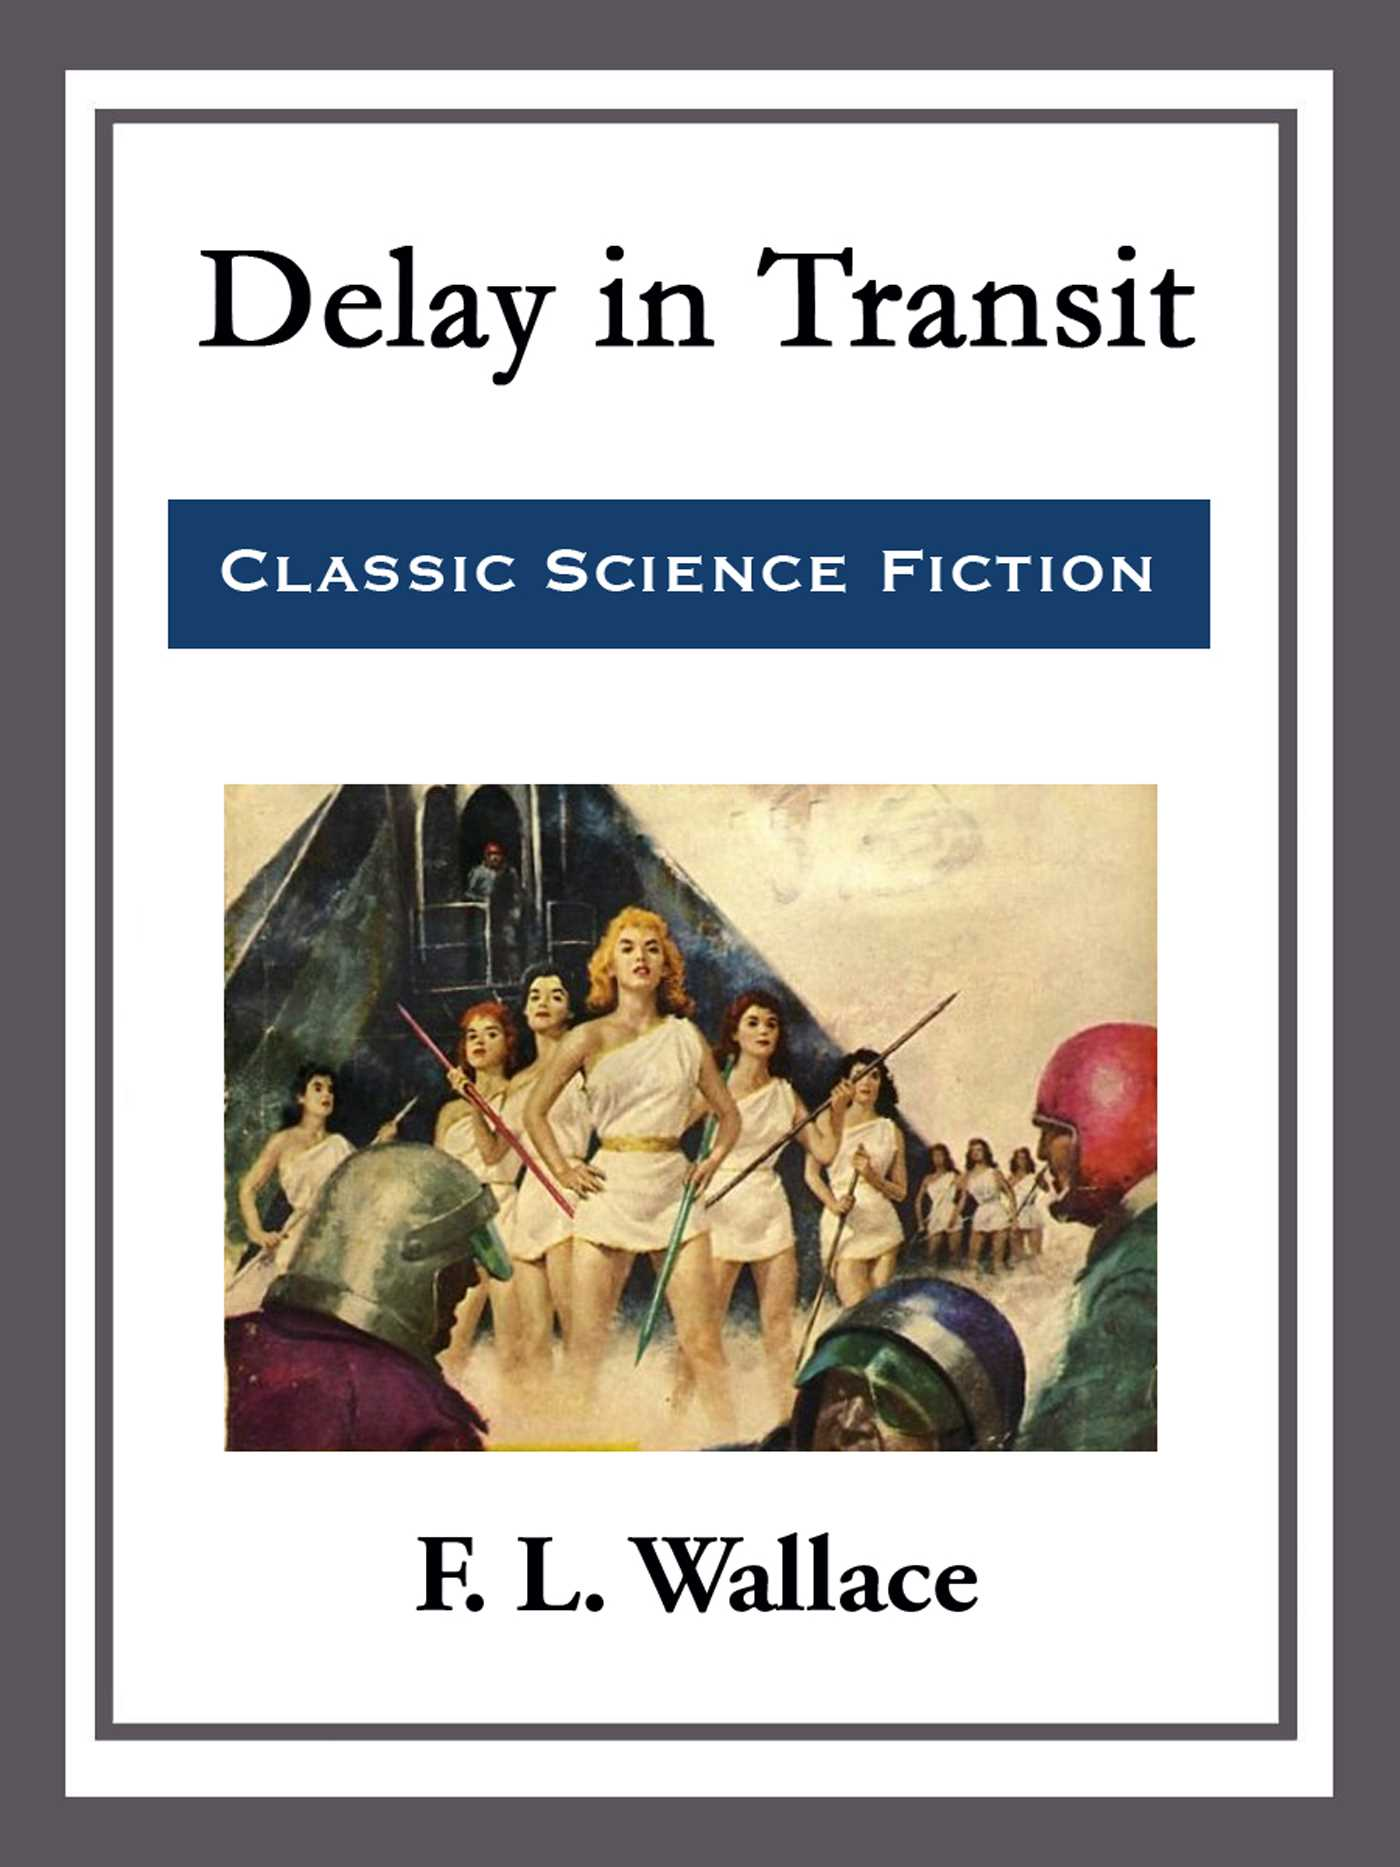 Delay in transit 9781682997413 hr